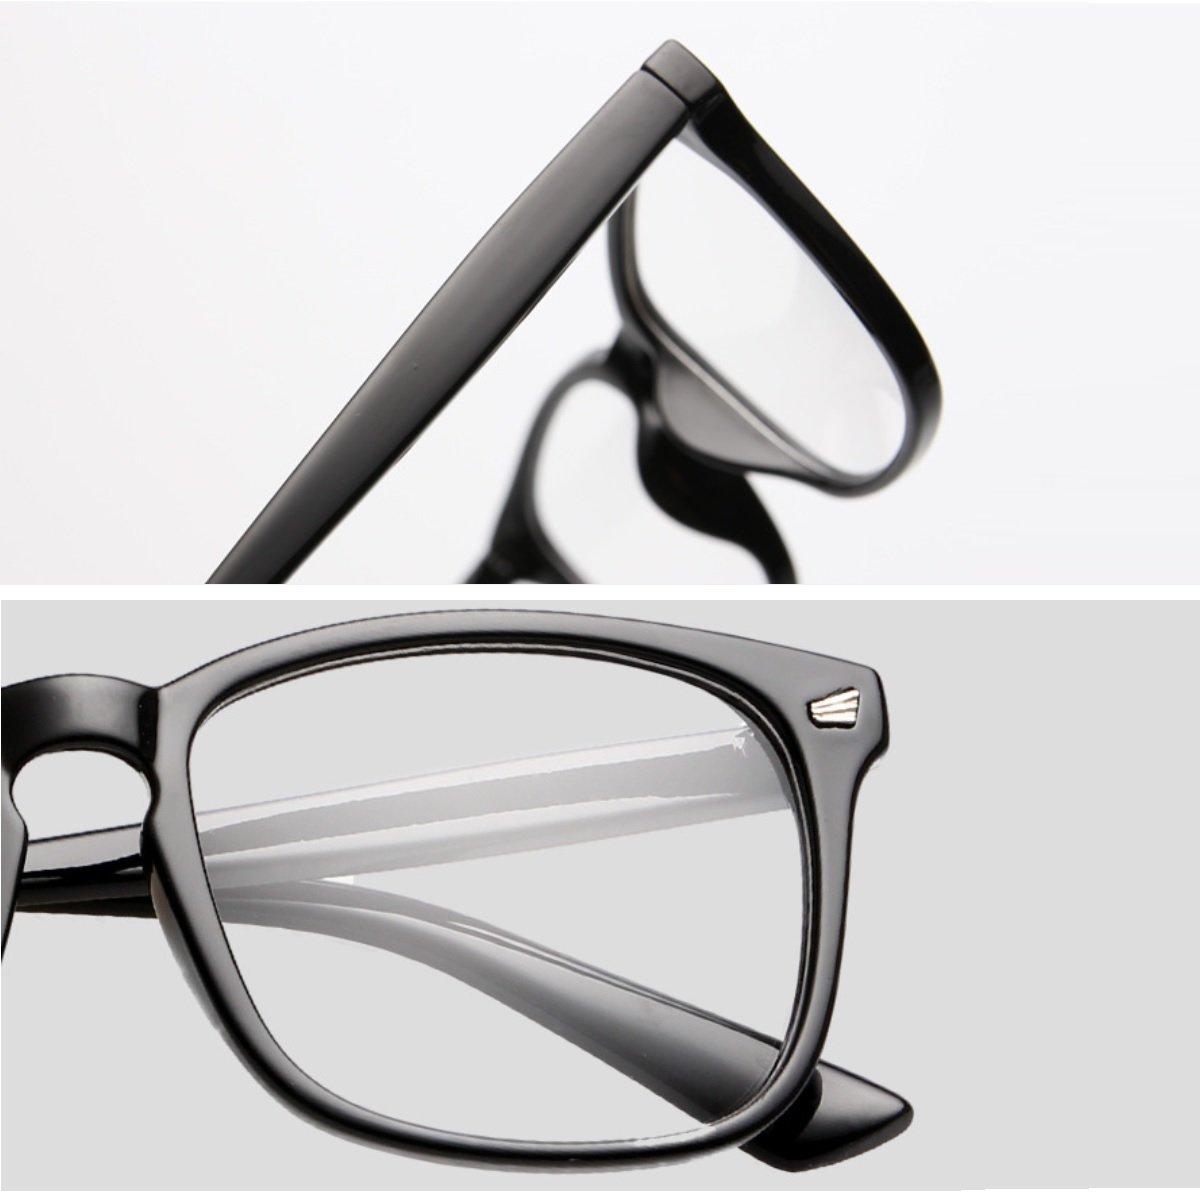 Cyxus Blue Light Filter Computer Glasses for Blocking UV Headache [Anti Eye Eyestrain] Transparent Lens, Unisex (Men/Women) (classic black) by Cyxus (Image #8)